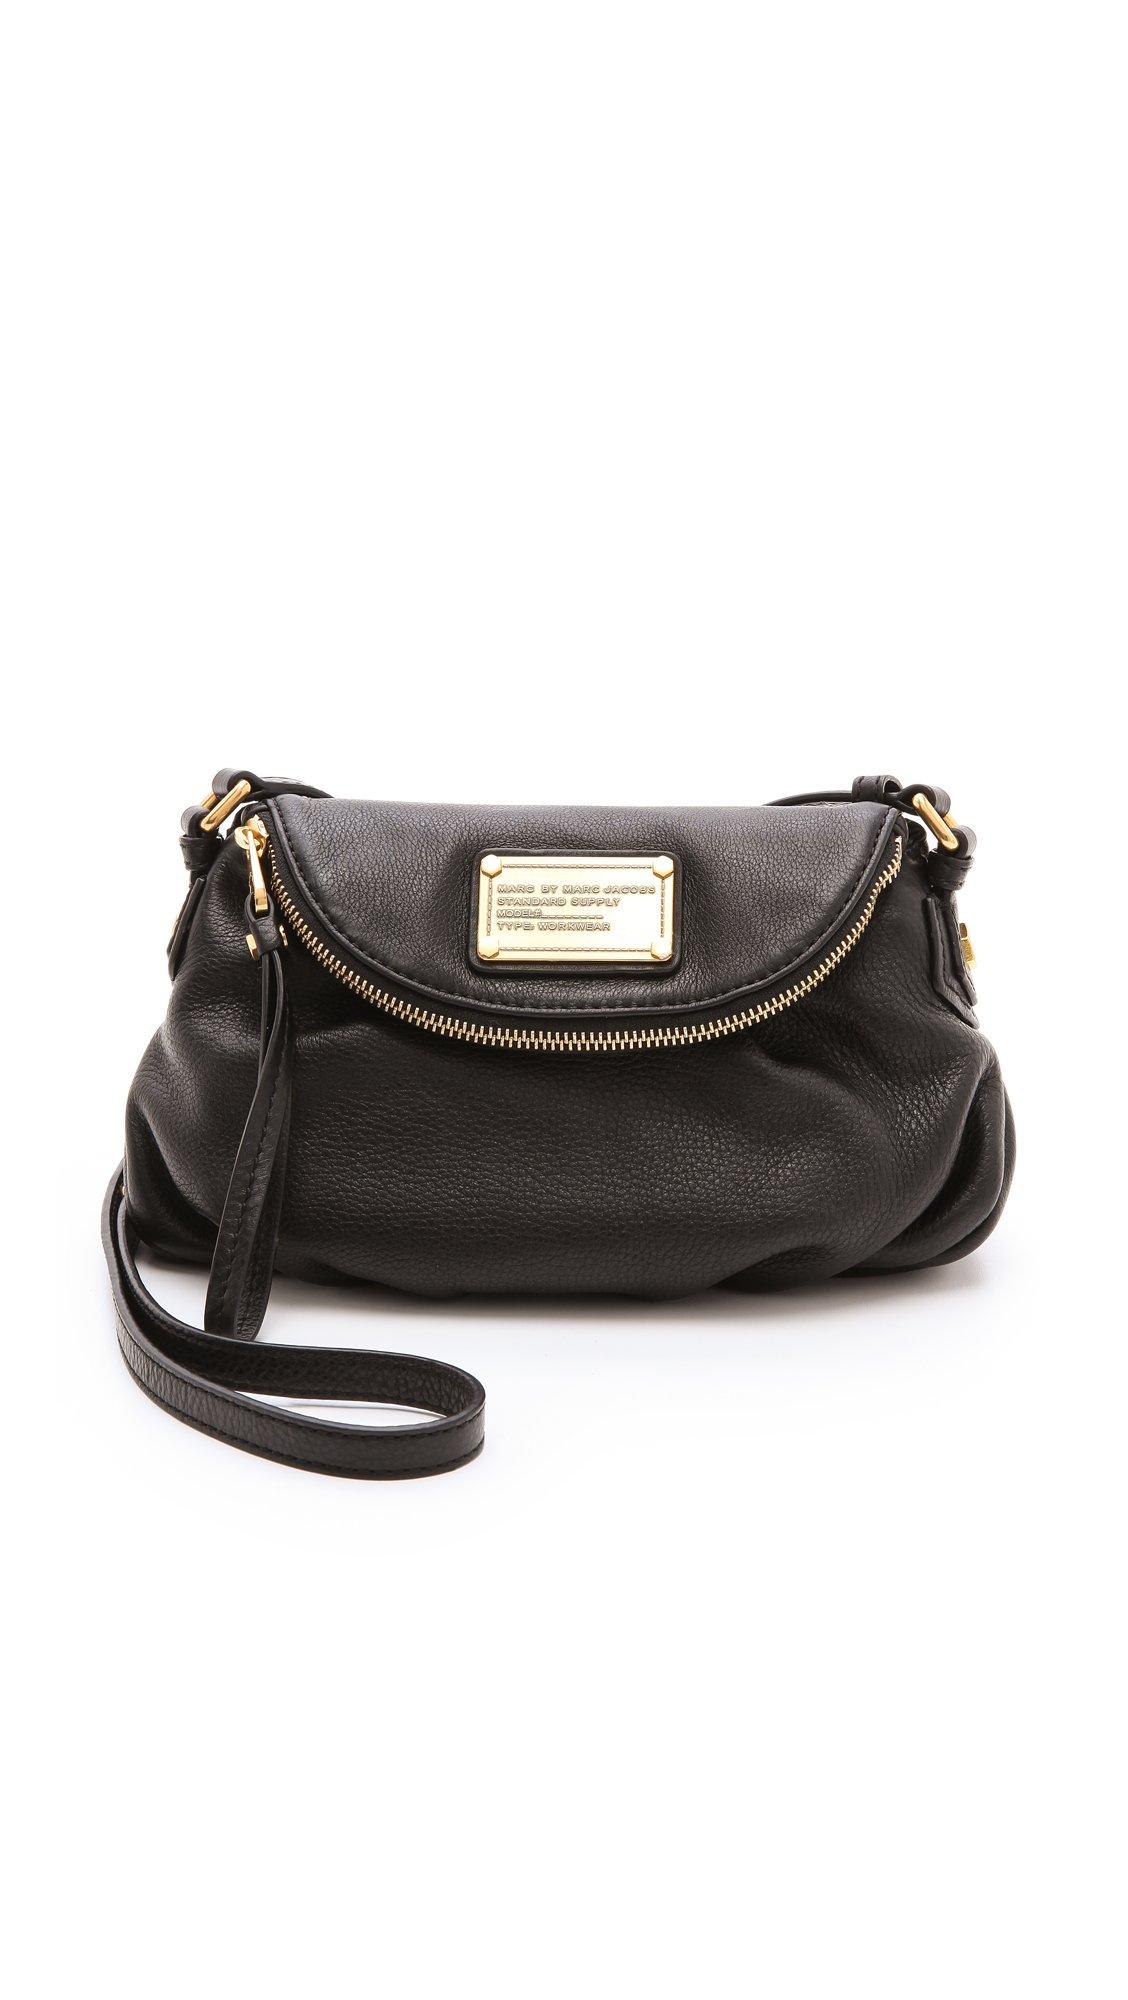 marc by marc jacobs classic q mini natasha bag in black lyst. Black Bedroom Furniture Sets. Home Design Ideas